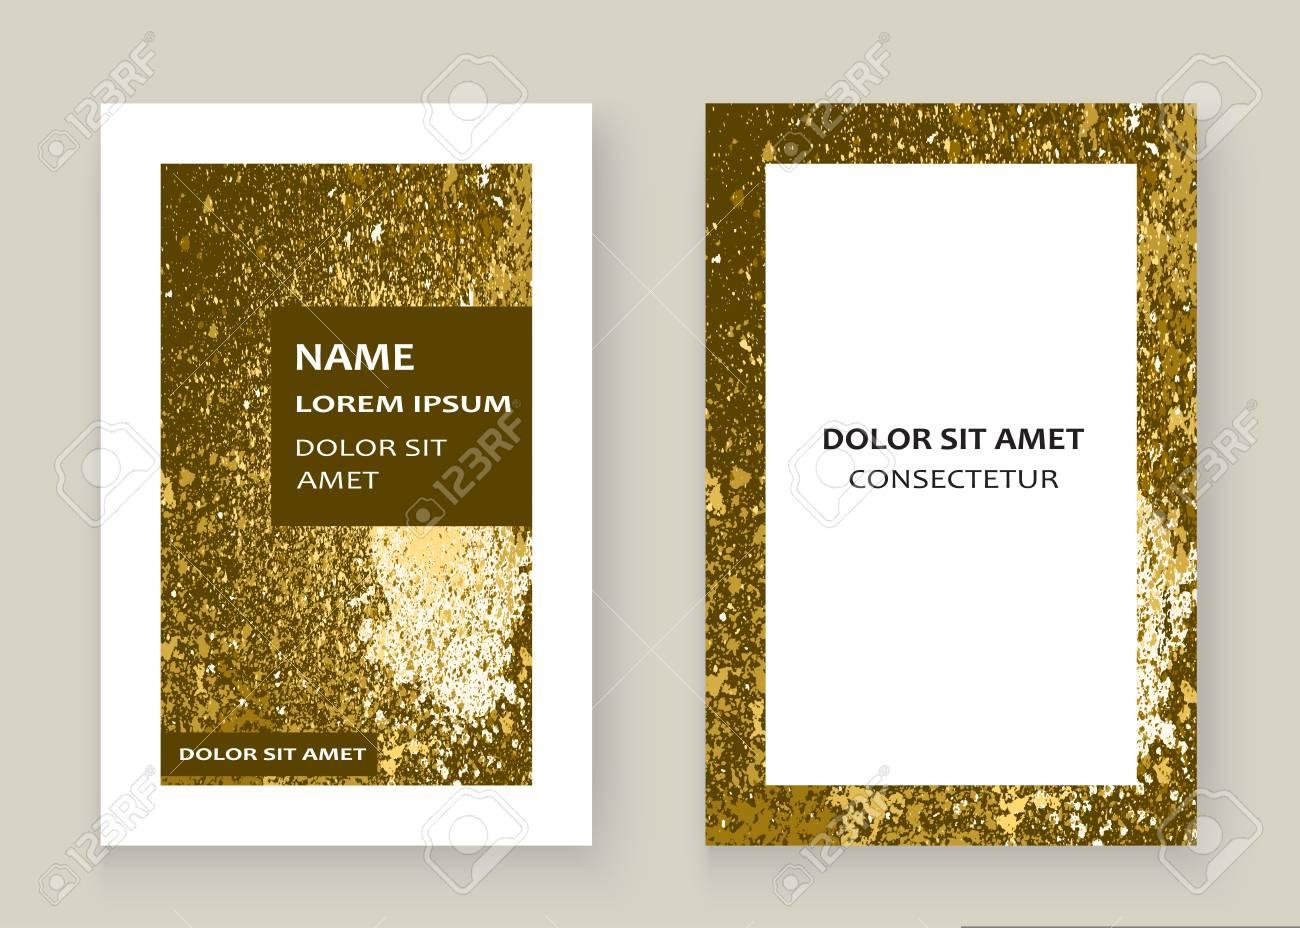 Erfreut Gold Glitter Bilderrahmen Ideen - Benutzerdefinierte ...